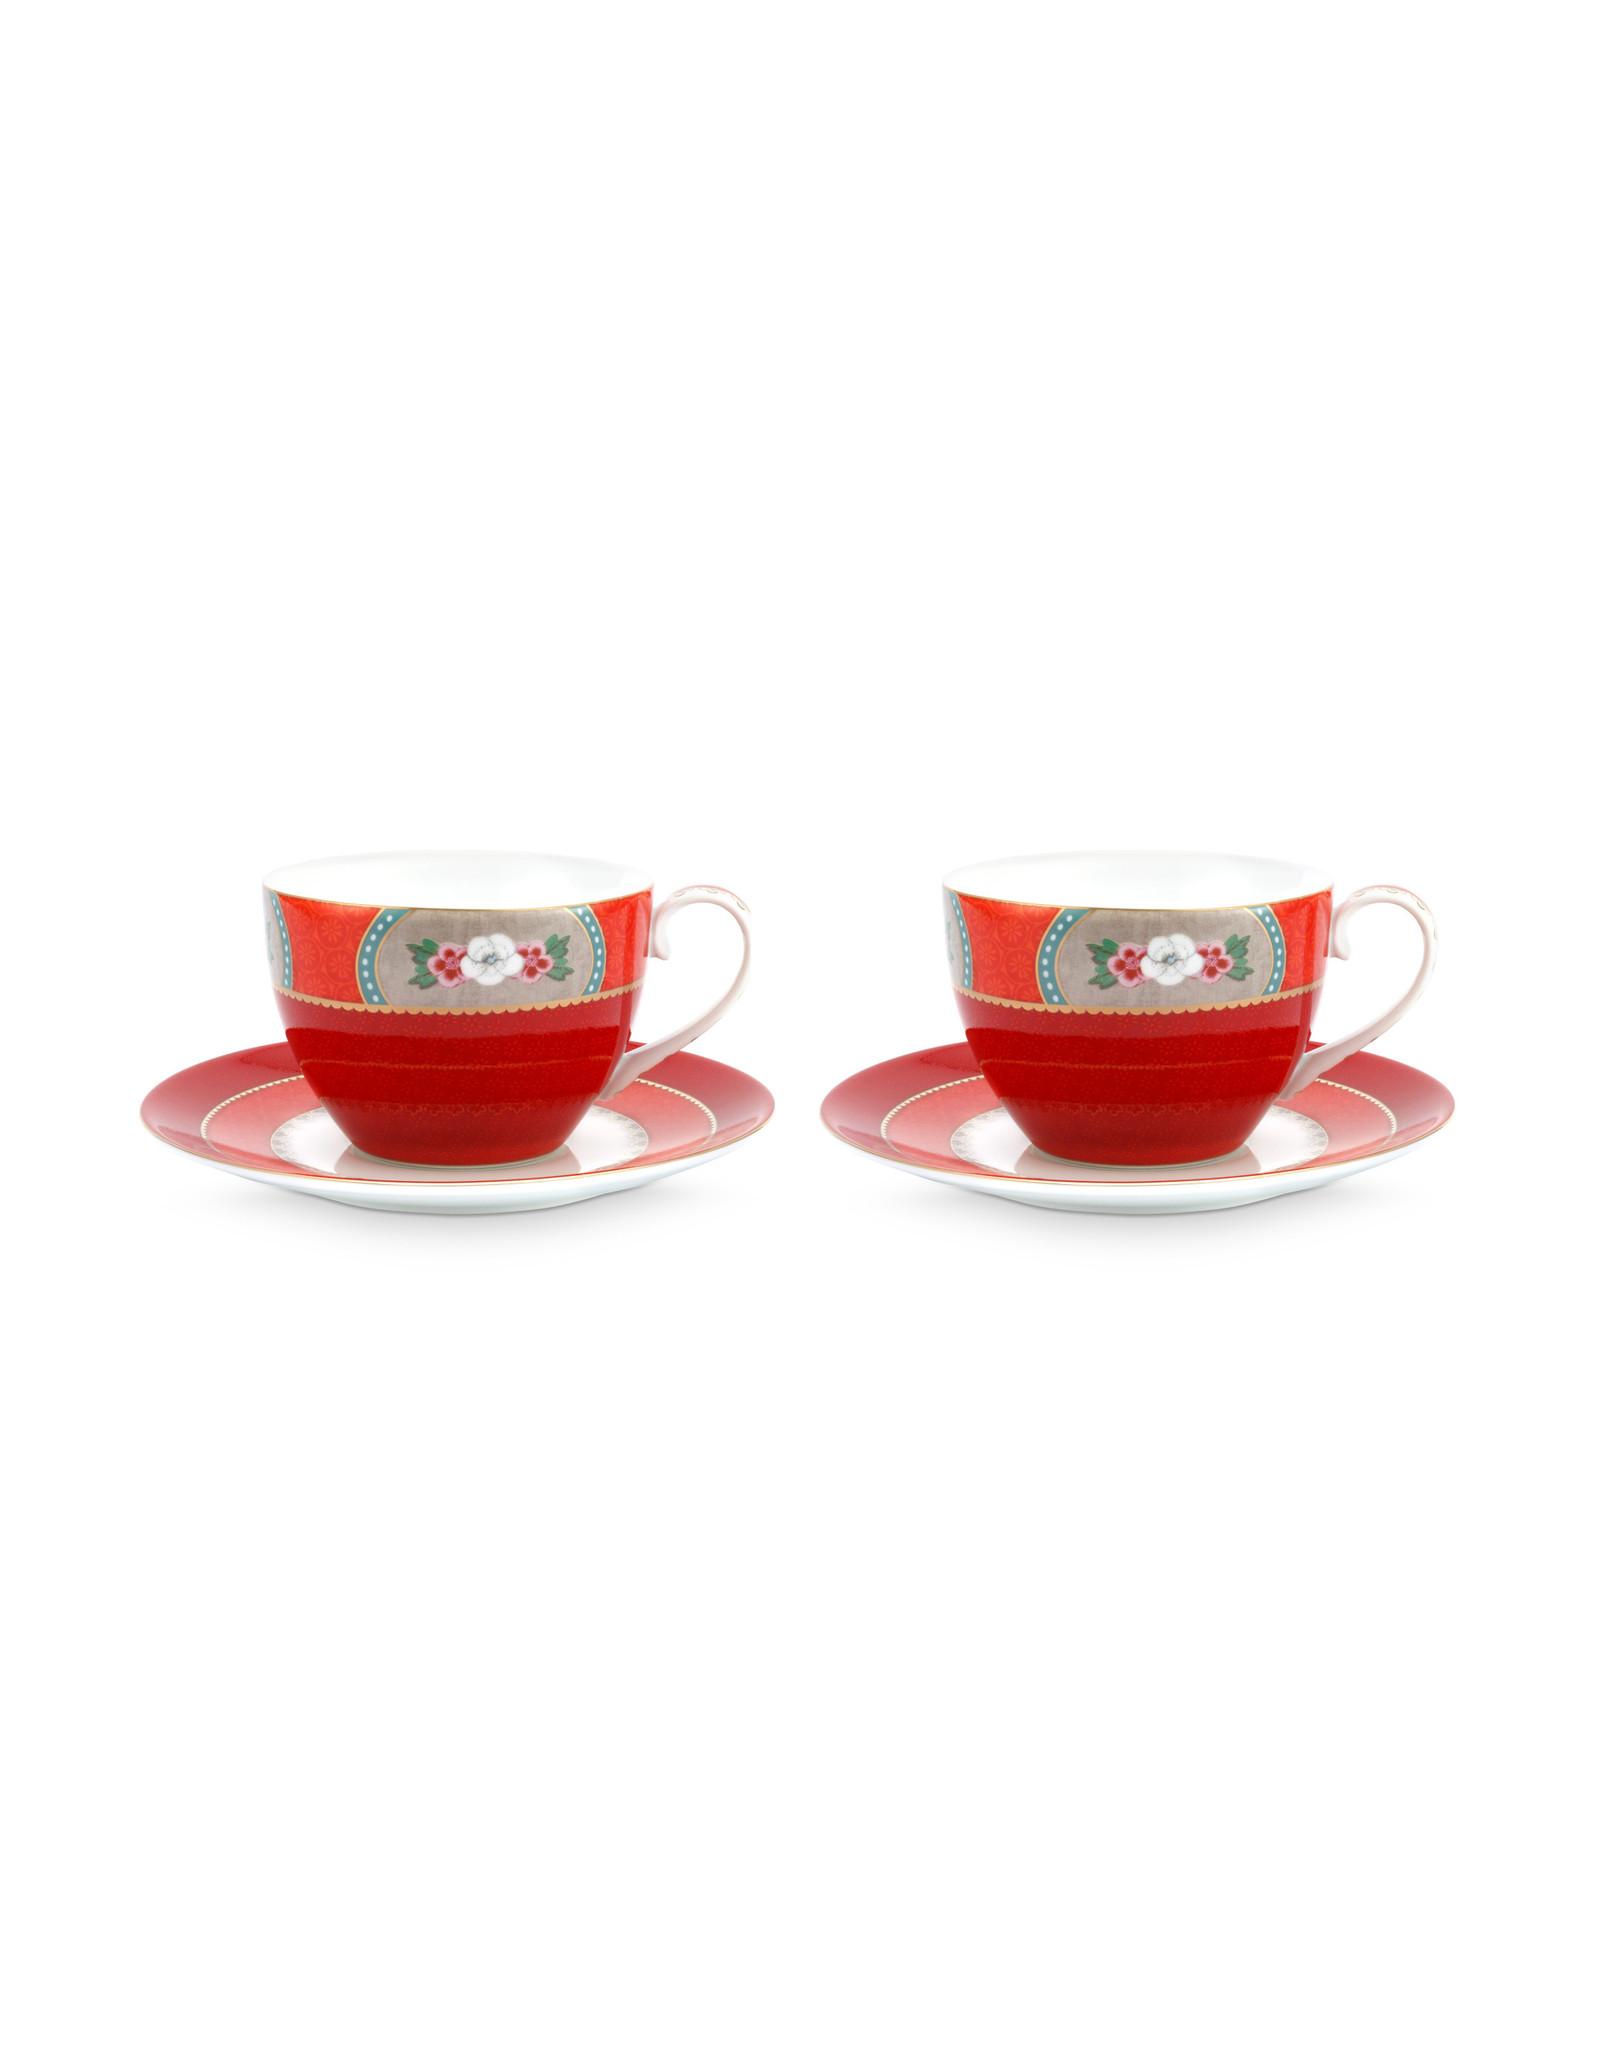 pip studio Set/2 Cups & Saucers Blushing Birds Red 280ml